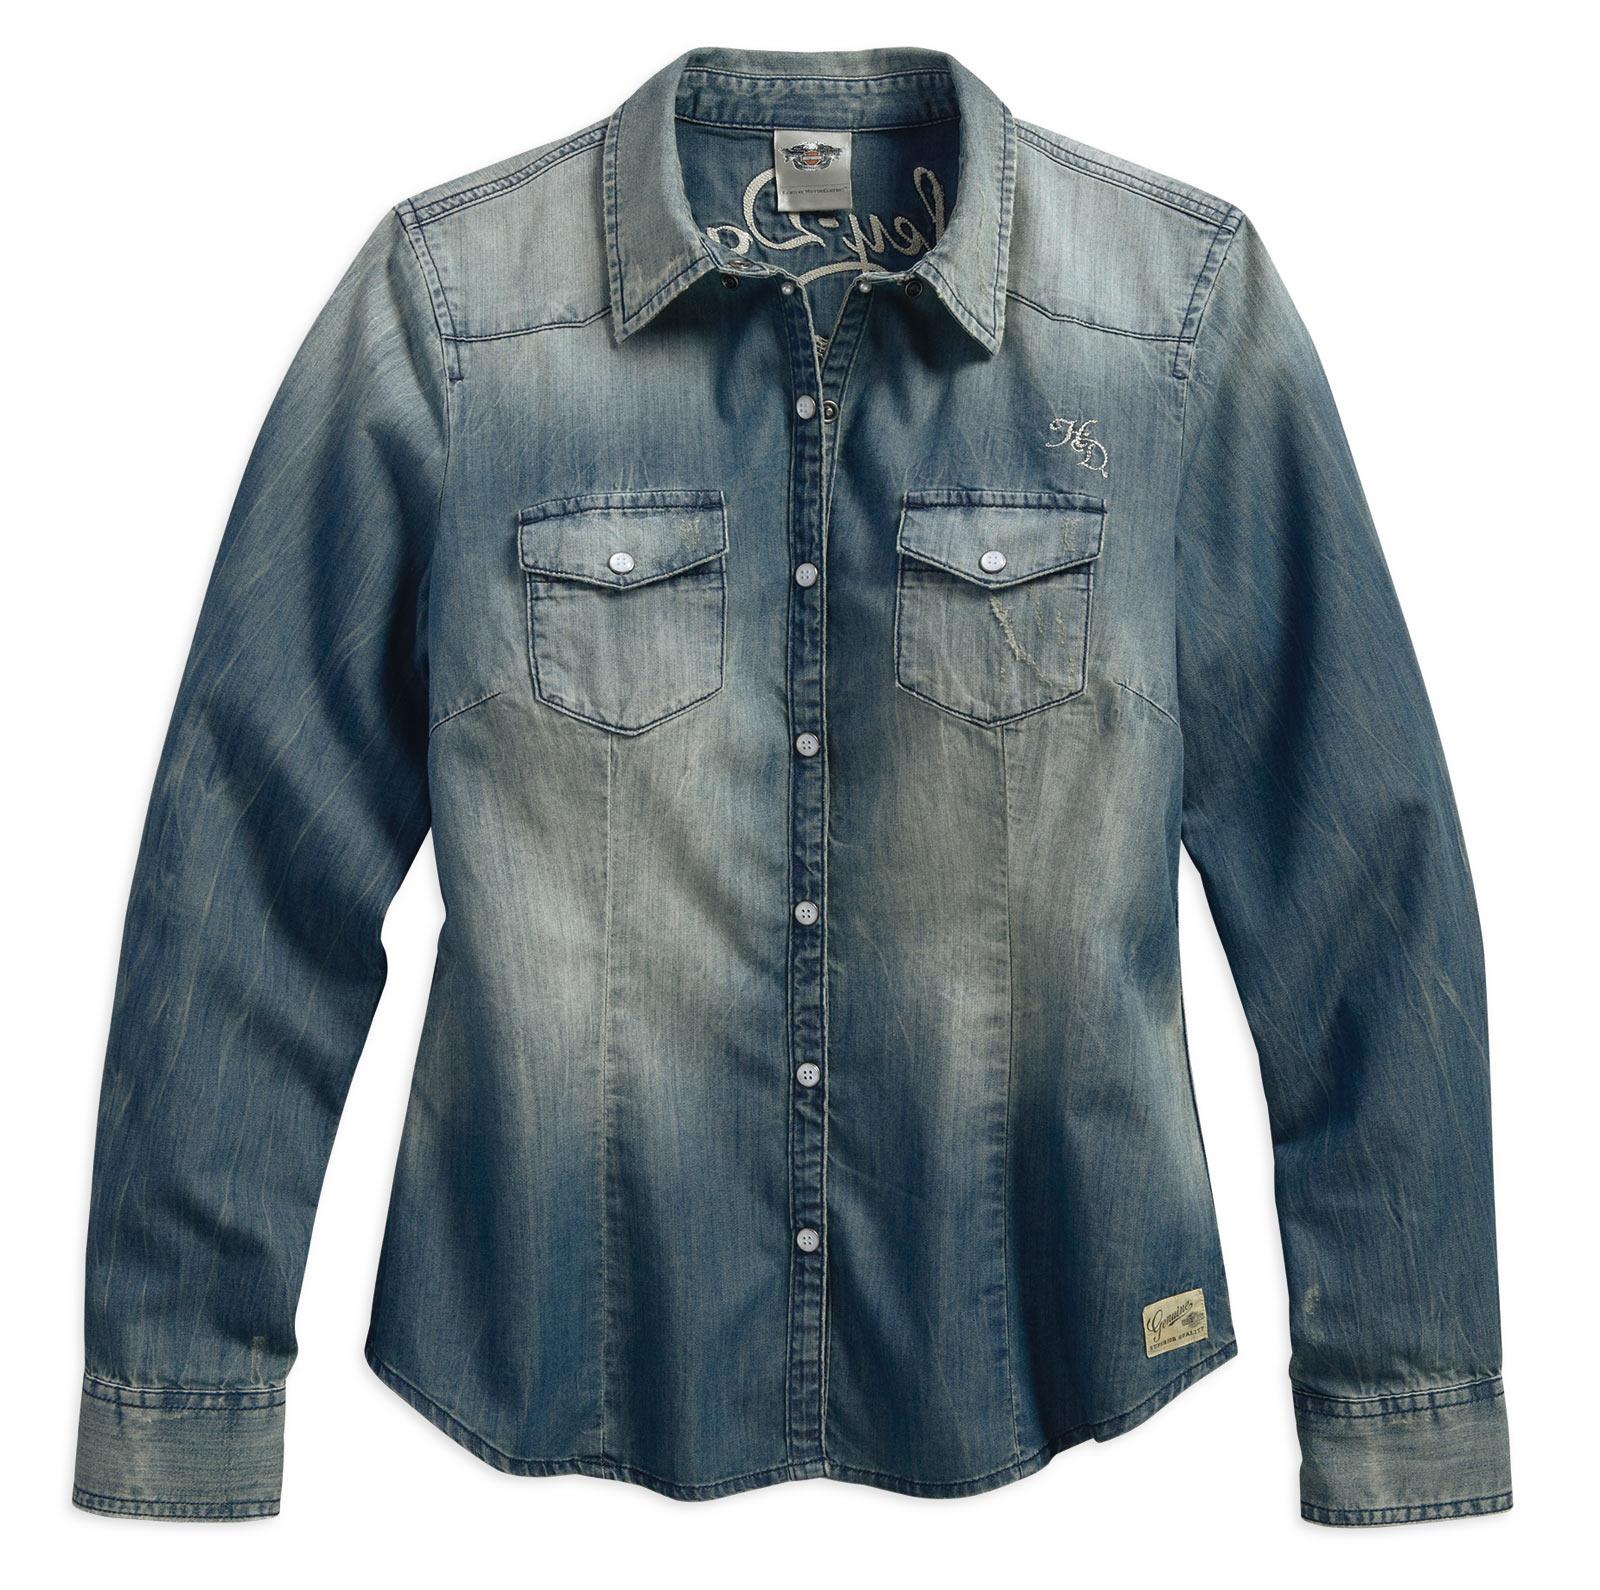 99159 17vw harley davidson jeanshemd genuine classic damen im thunderbike shop. Black Bedroom Furniture Sets. Home Design Ideas